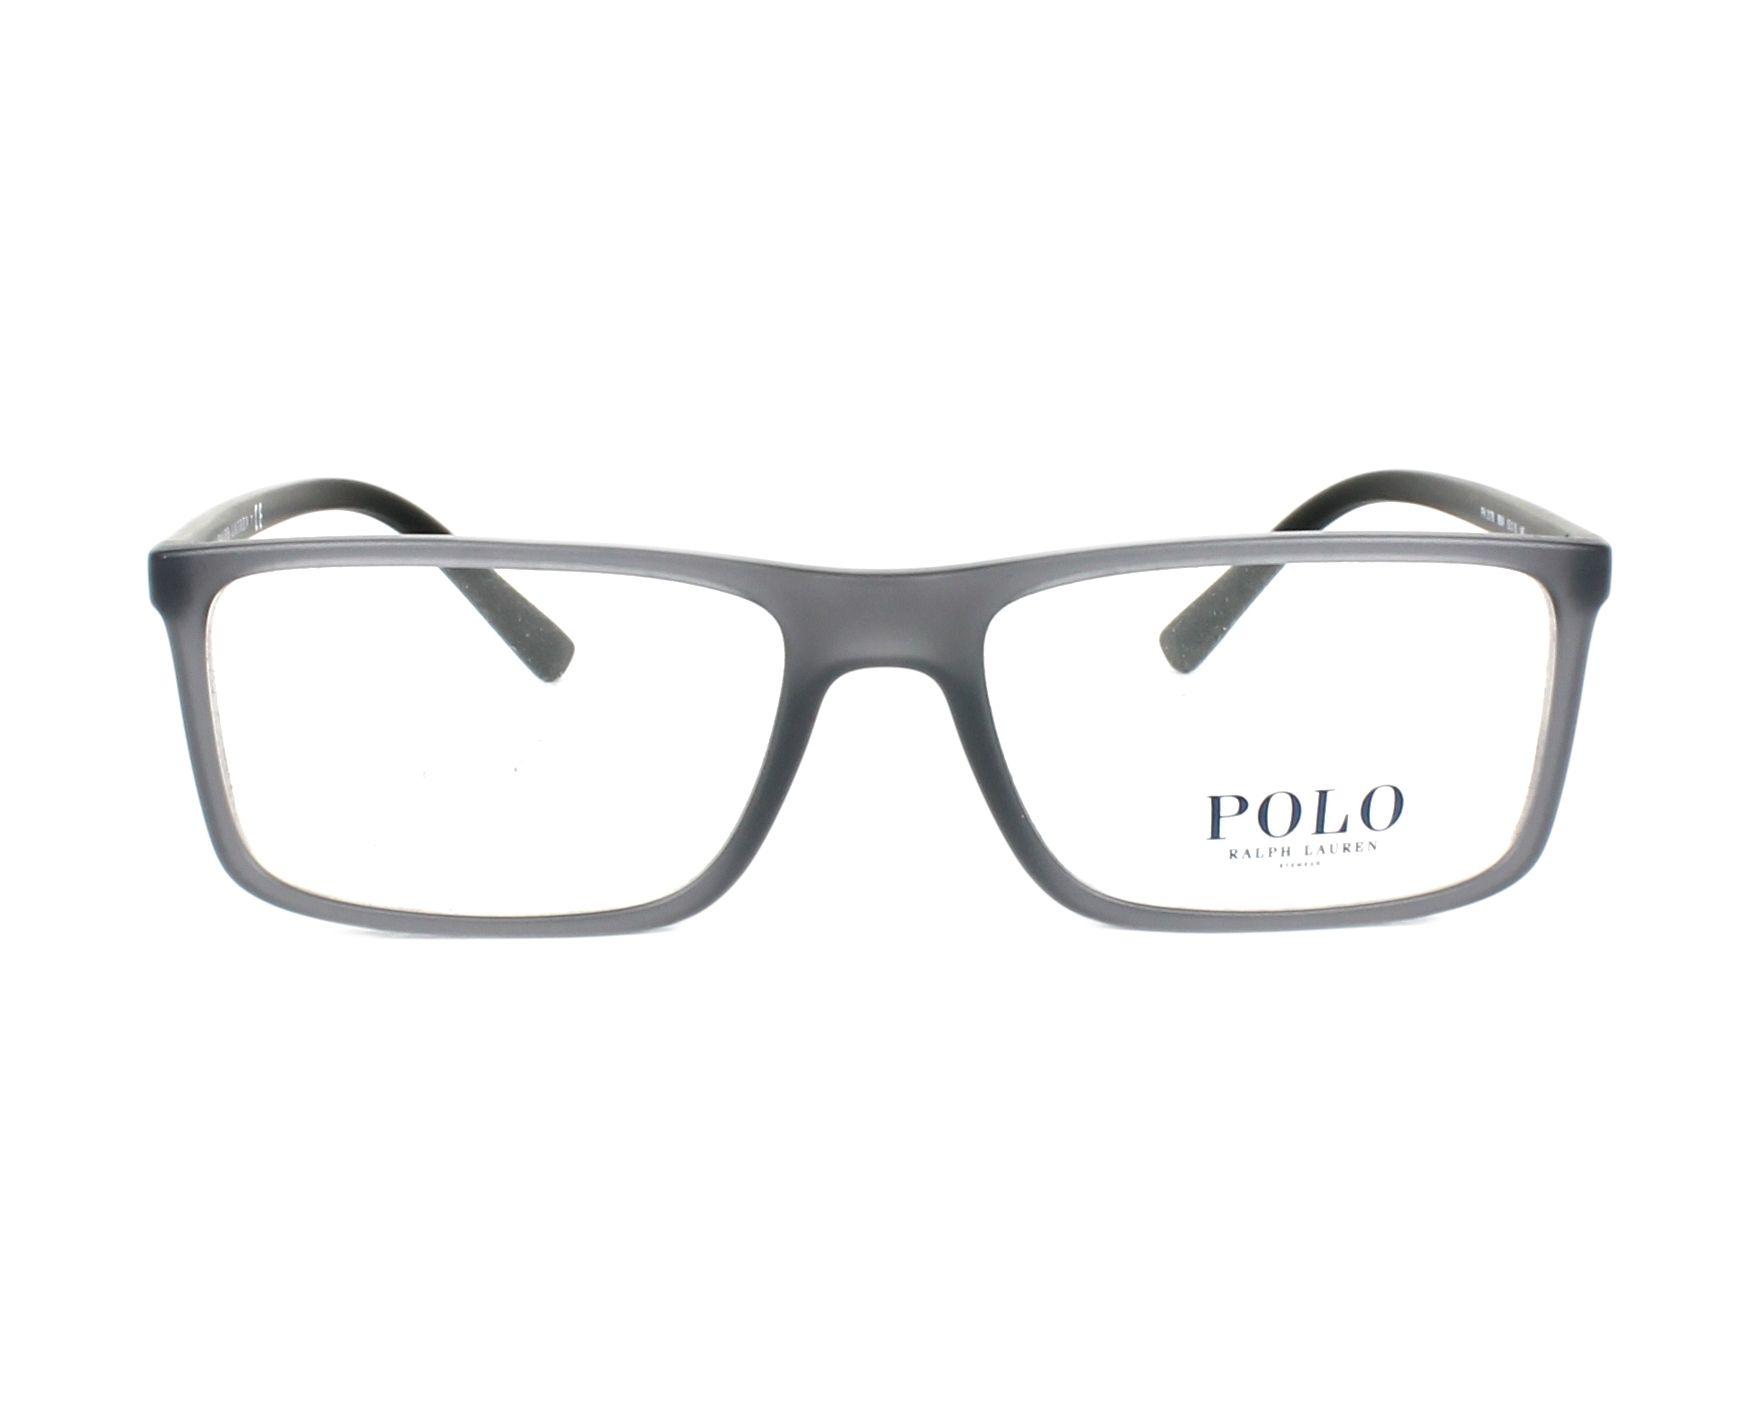 2a31974df0c eyeglasses Polo Ralph Lauren PH-2178 5604 53-16 Grey front view